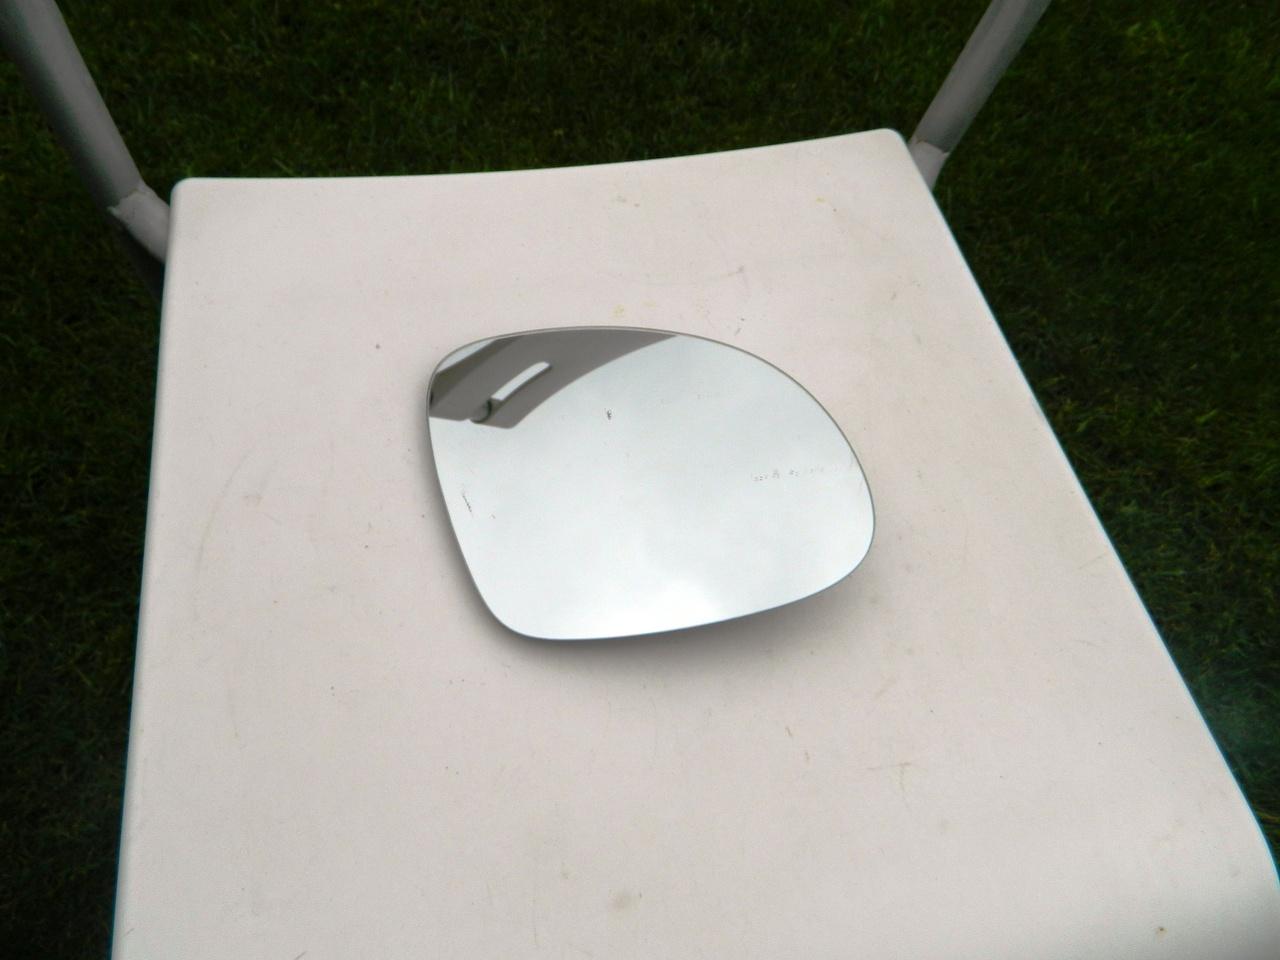 Geam oglinda dreapta incalzita VW Tiguan Model 2007-2011 cod 5N0857522